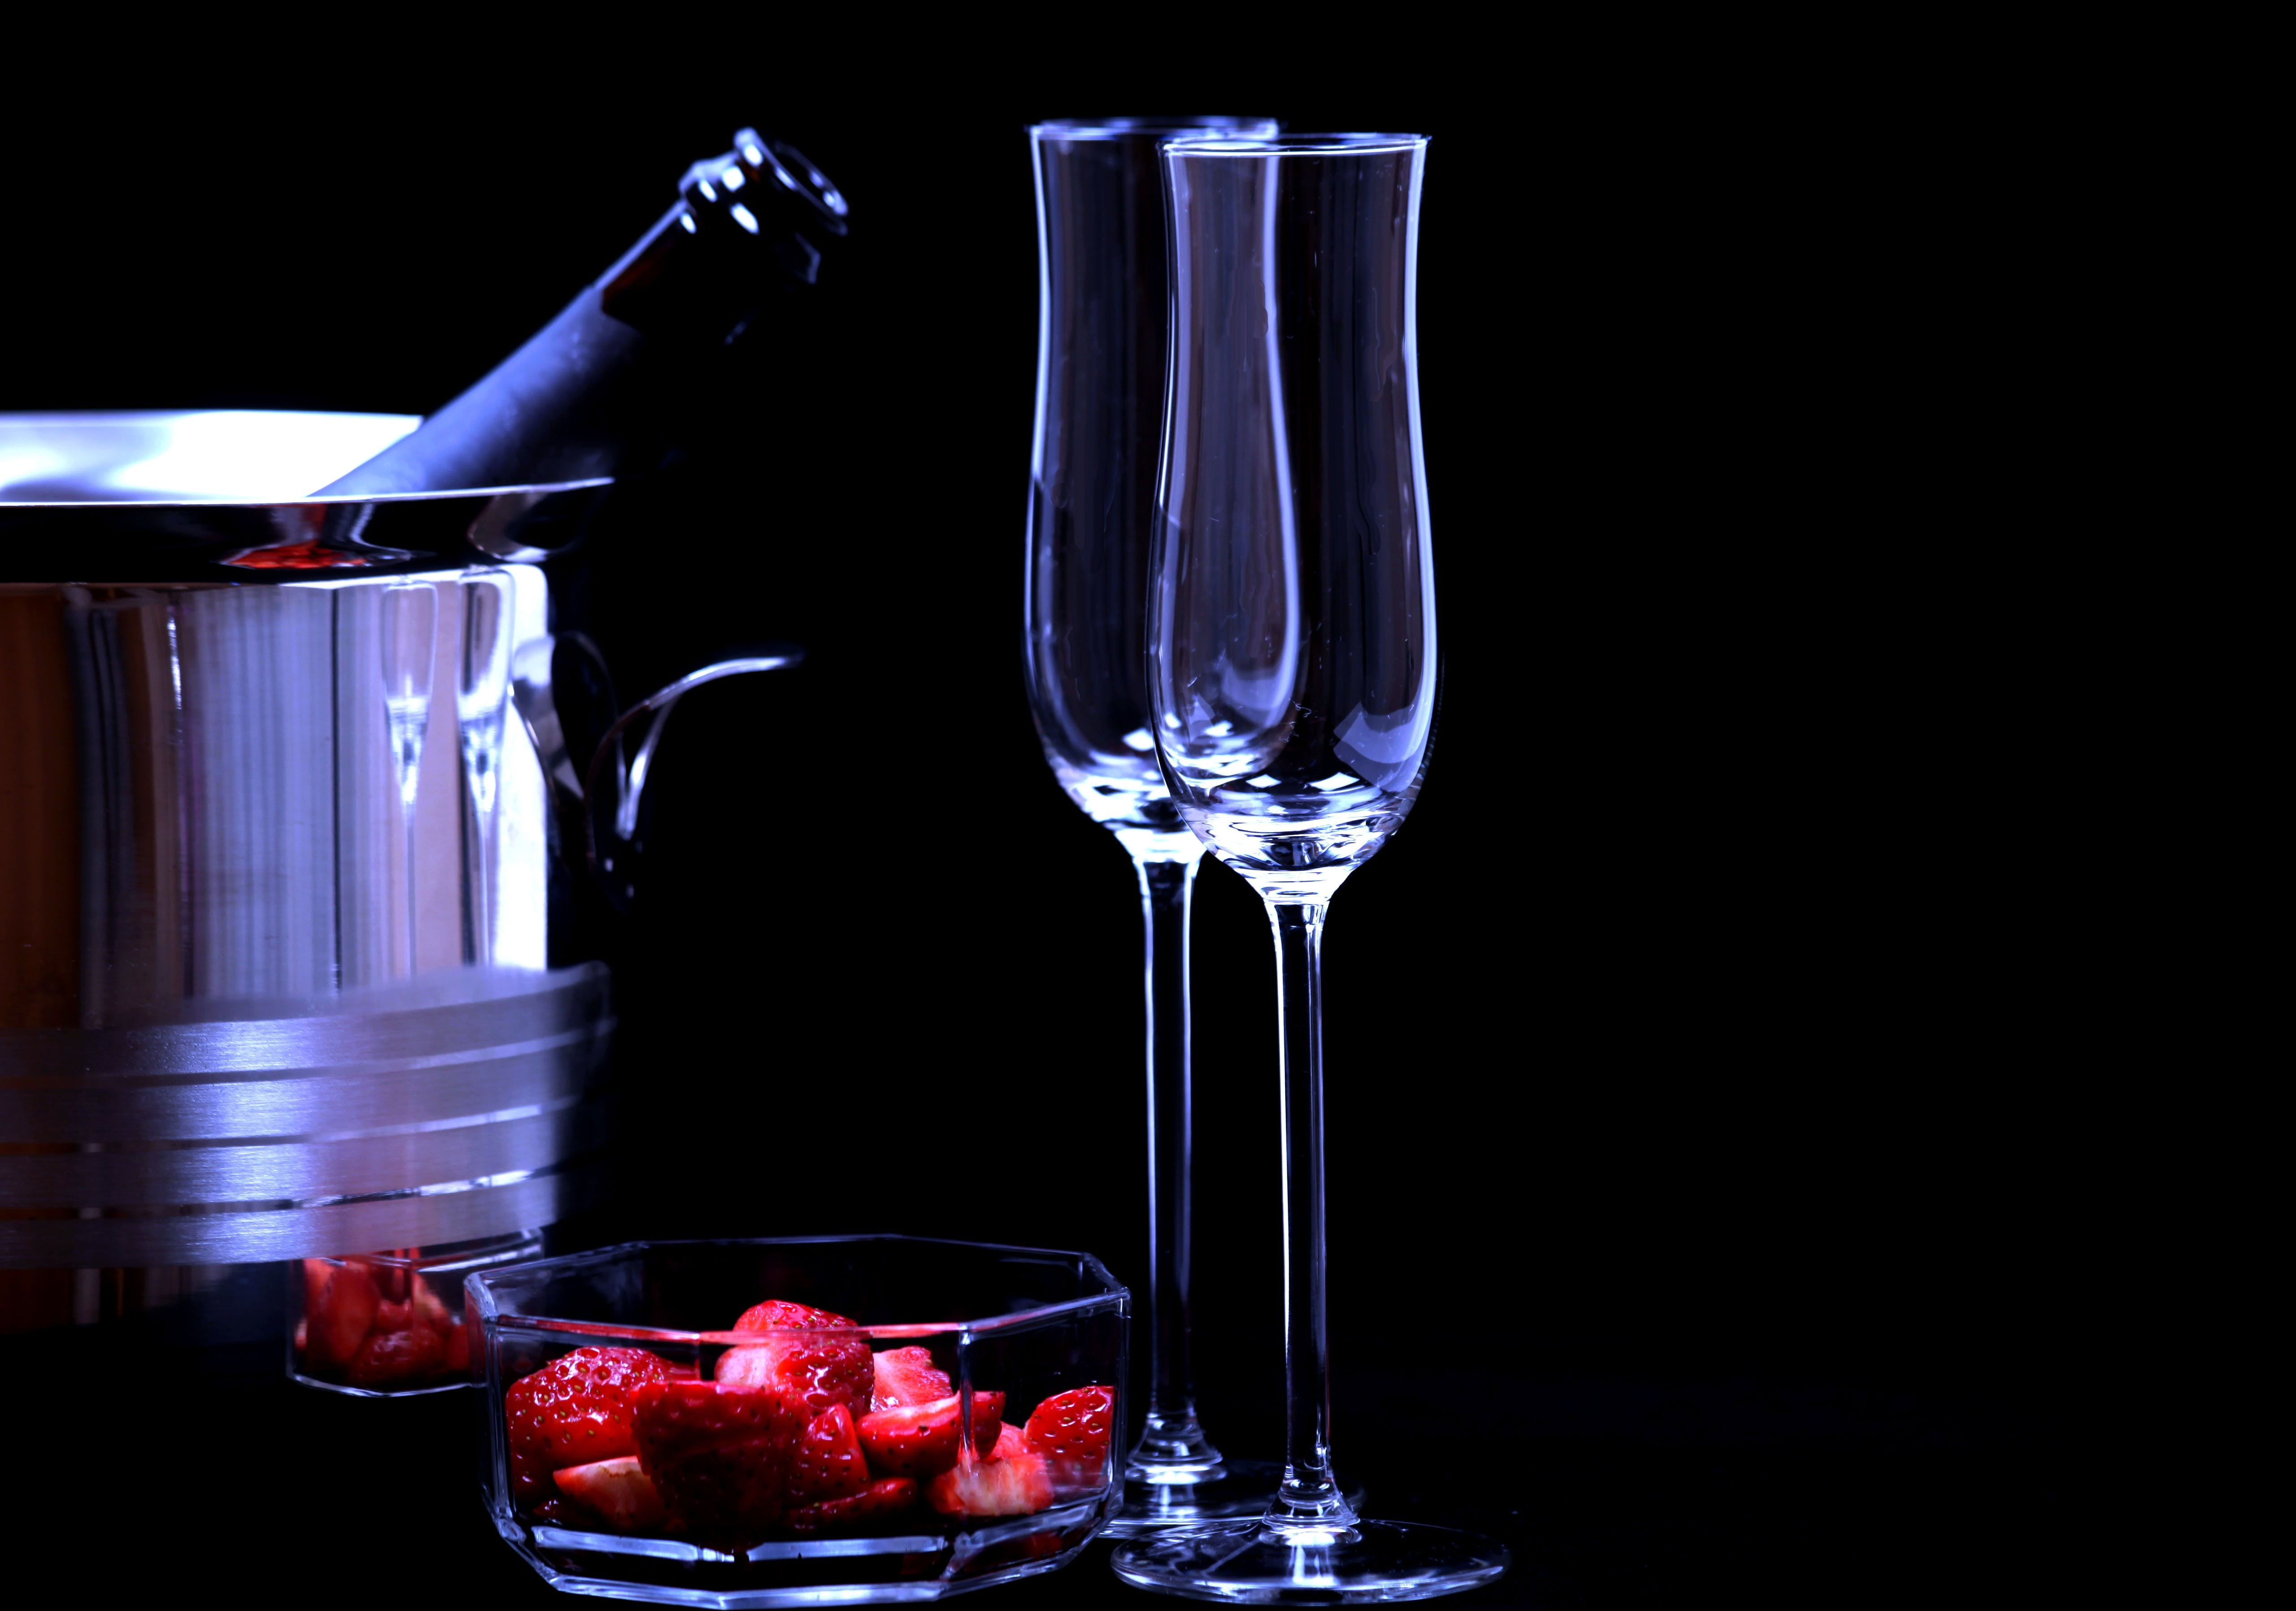 alkoholisches getränk, champagner, erdbeeren